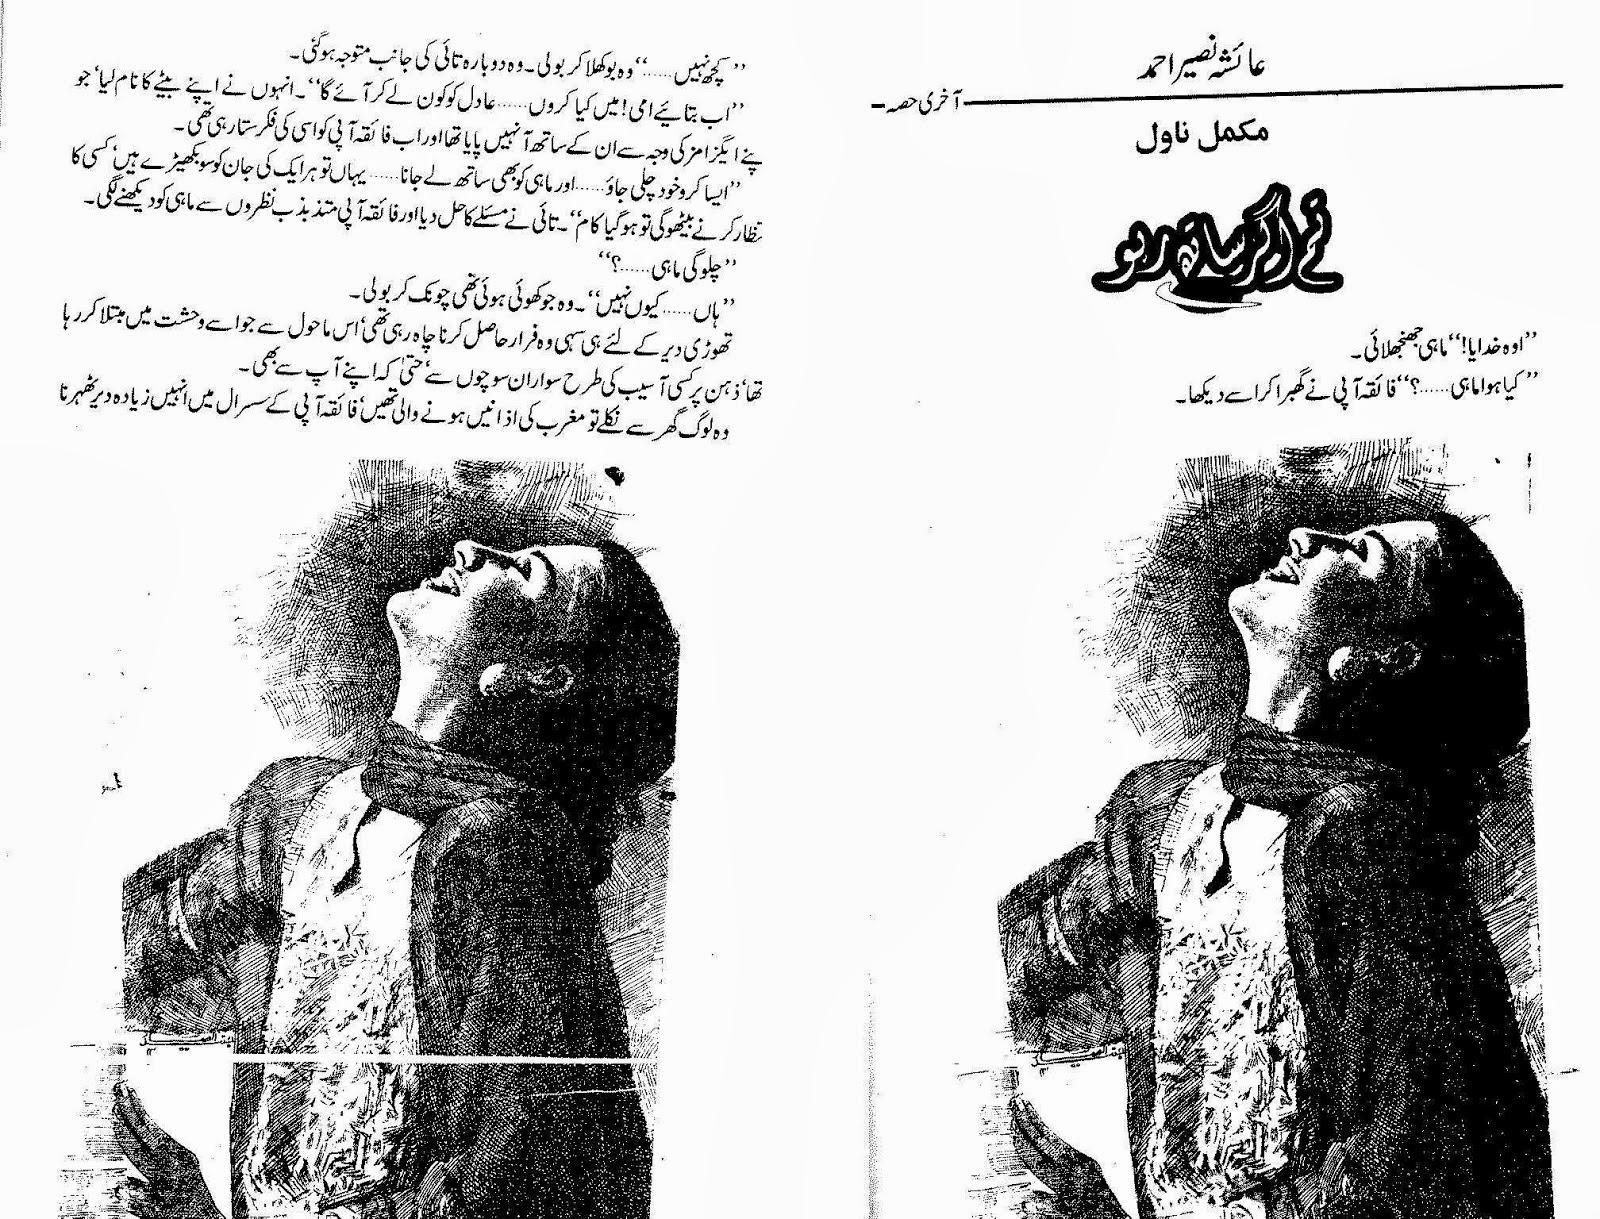 Kitab Dost: Tum agar sath raho novel by Ayesha Naseer